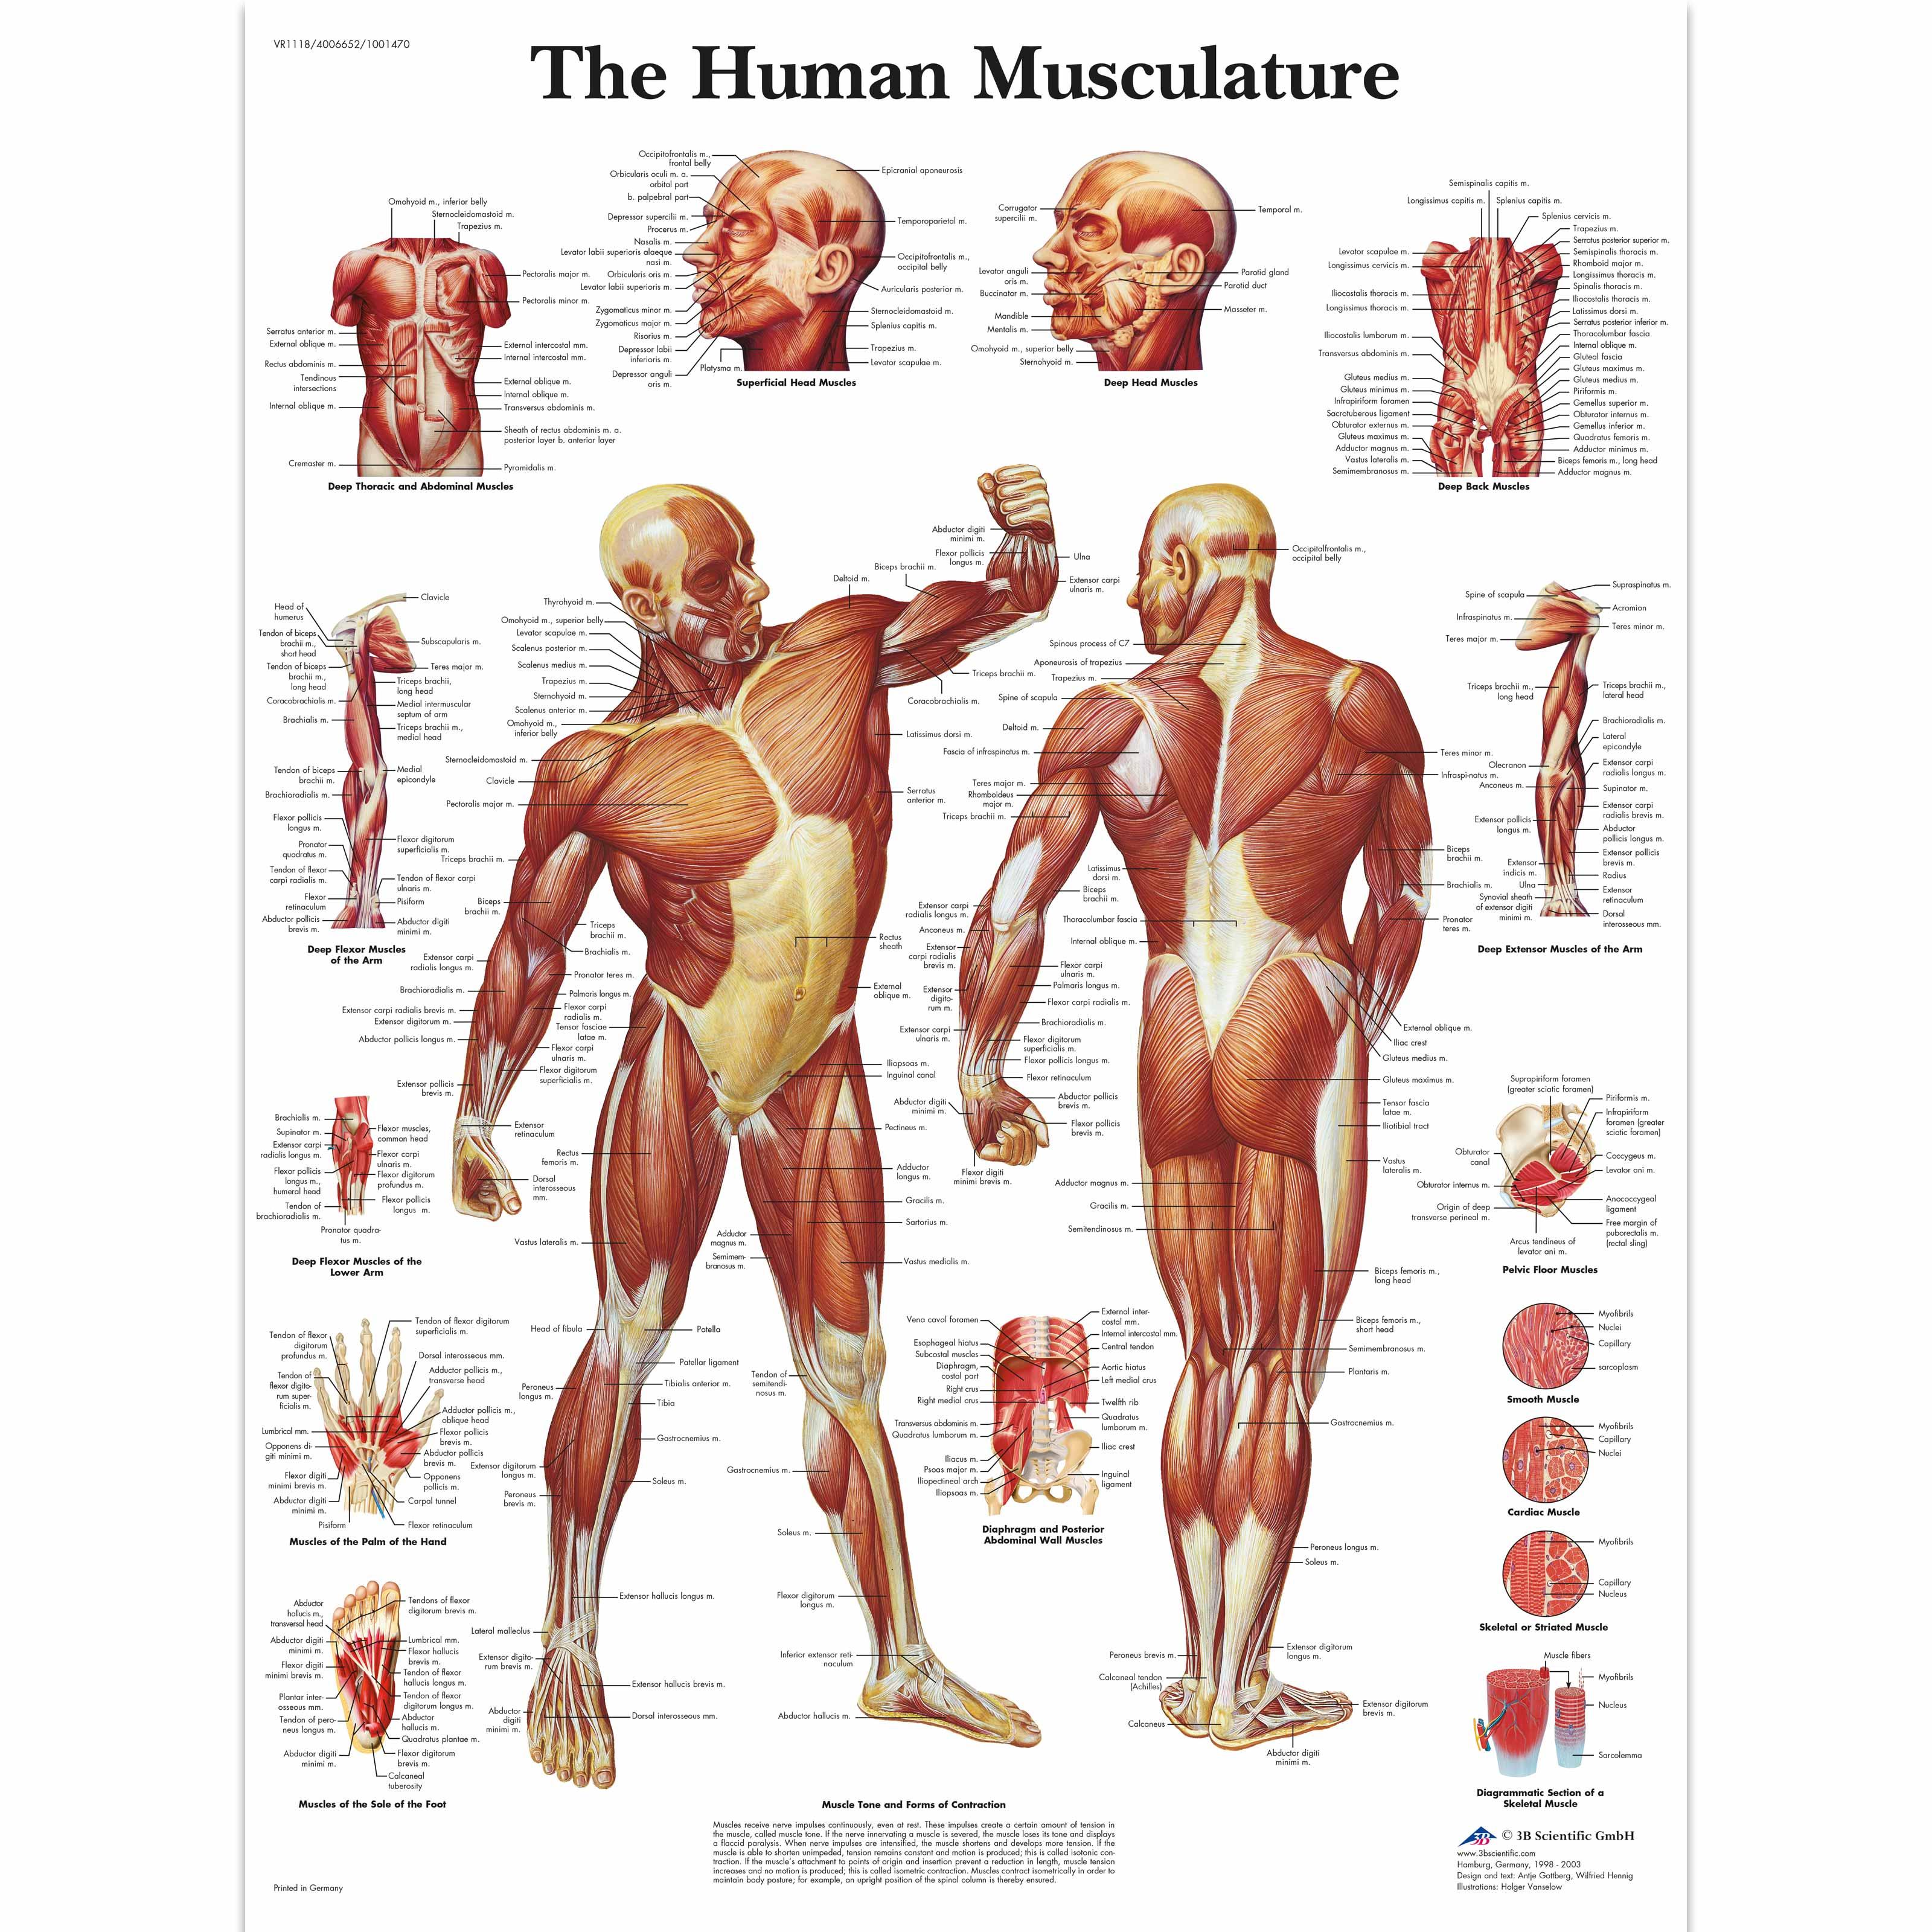 Human Muscle Chart Human Muscle Poster Human Musculature Chart